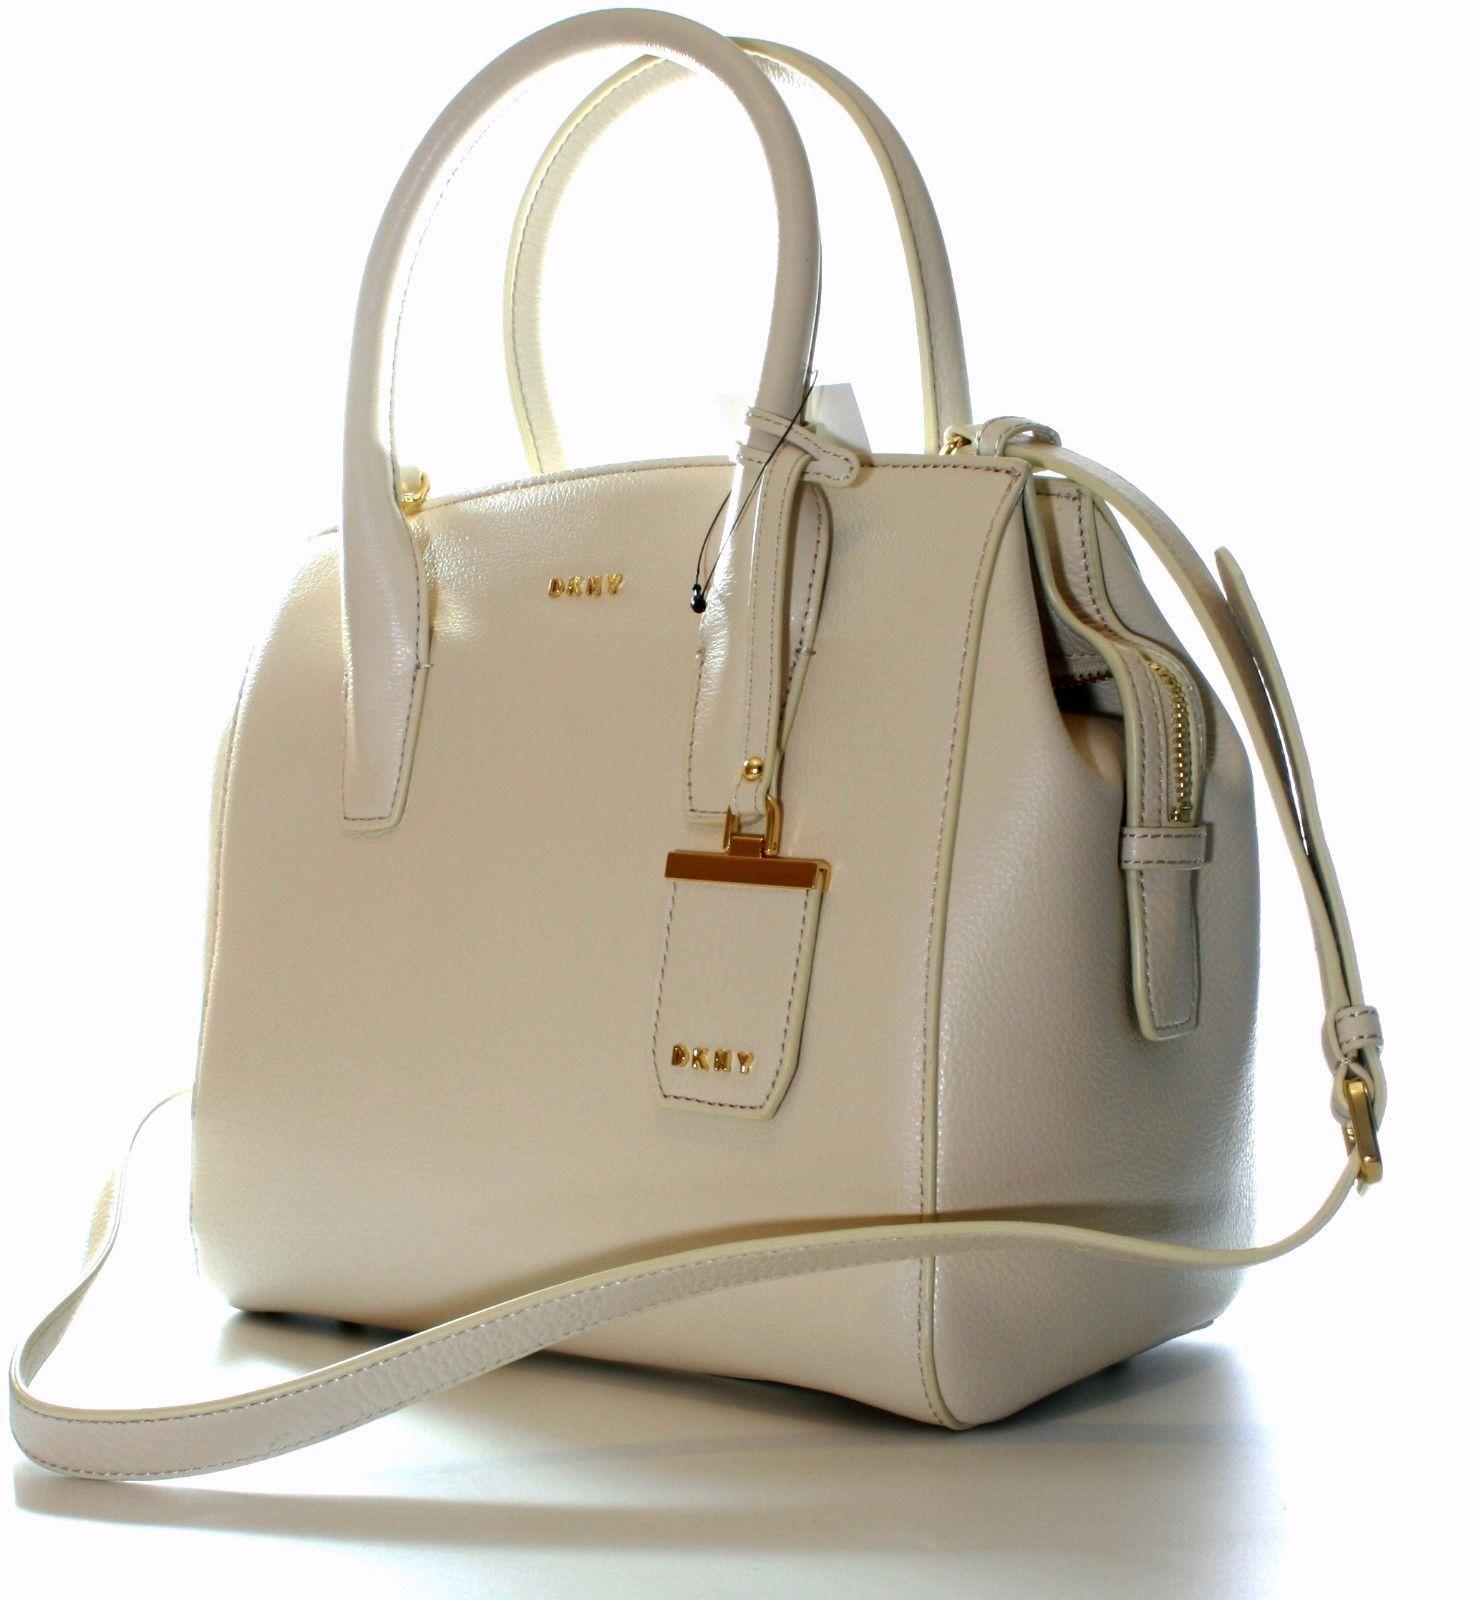 DKNY Donna Karan Sand Dollar Cream Leather Top Handle Bag Medium Handbag RRP£265